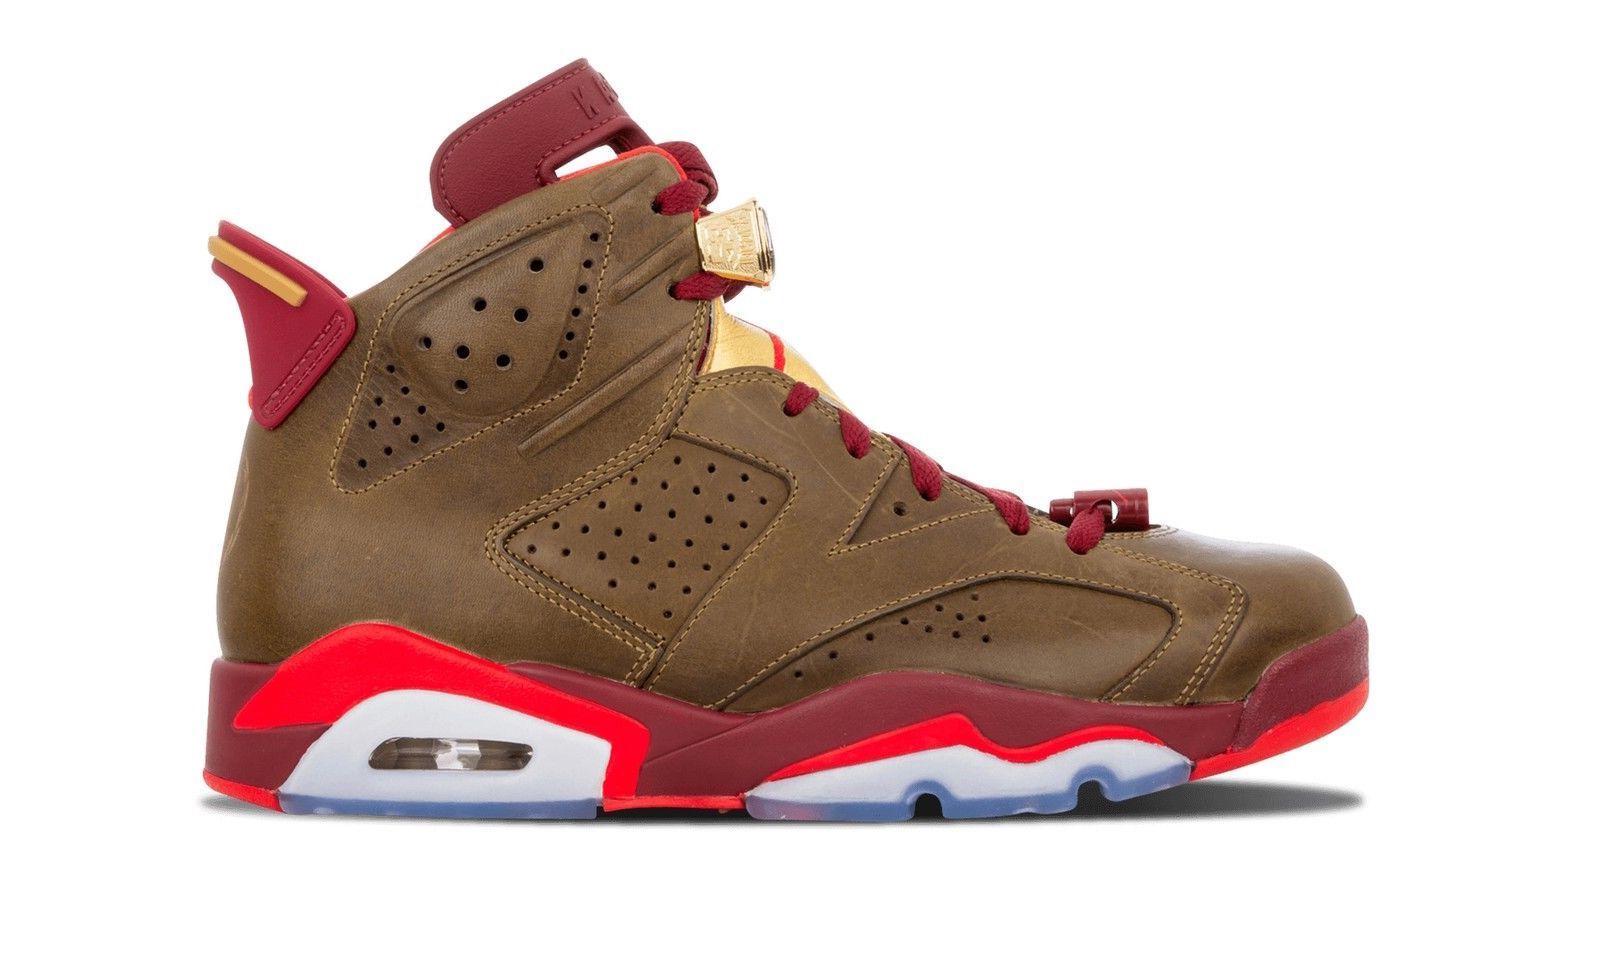 Size 10.5 Men's Nike Air Jordan Retro 6